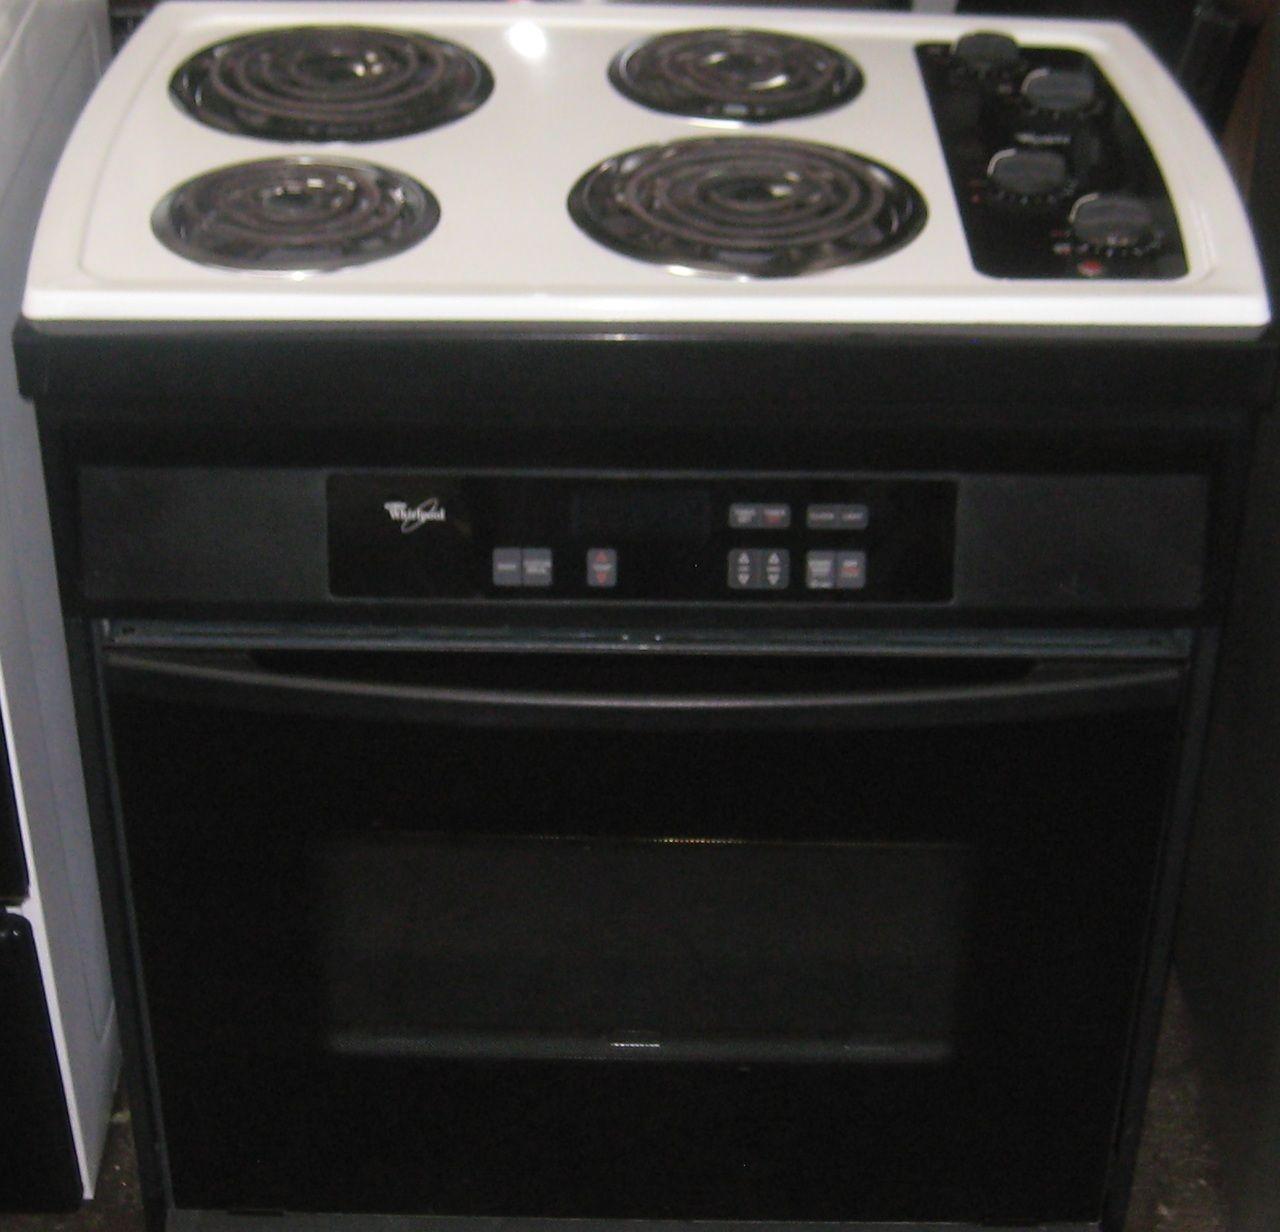 Appliance City WHIRLPOOL 30 INCH DROP IN ELECTRIC RANGE